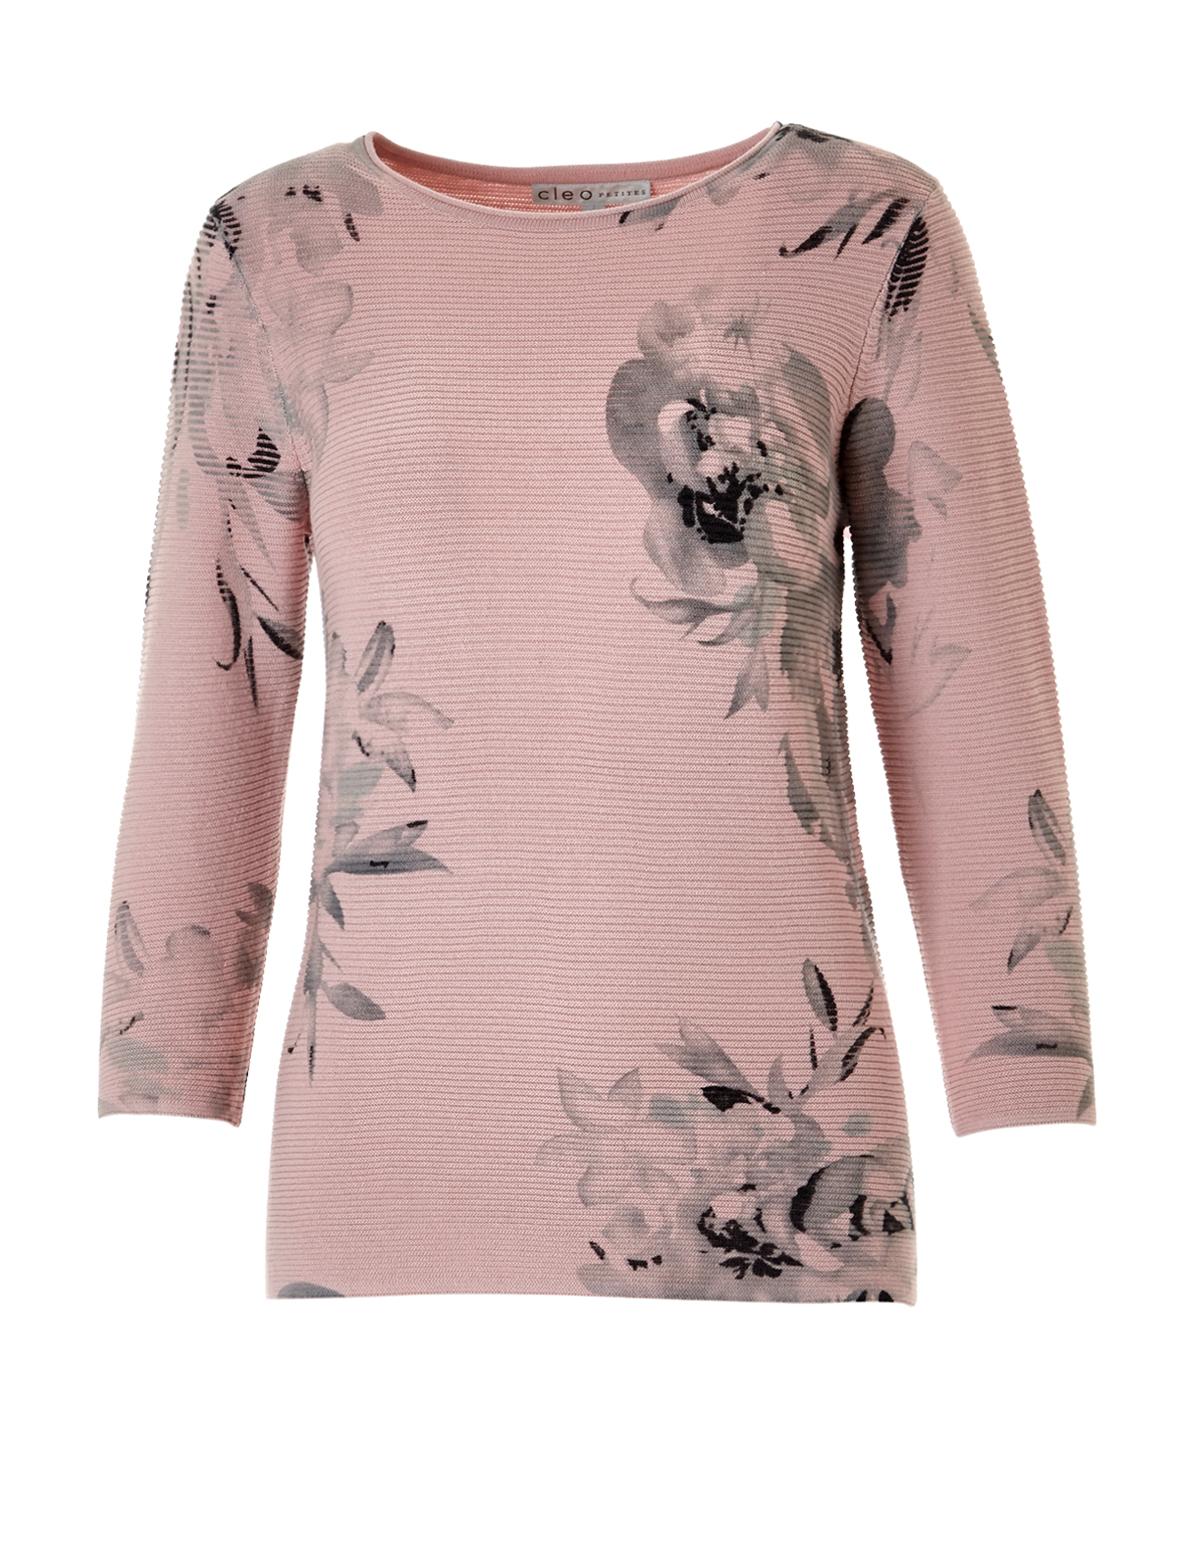 Soft Pink Ottoman Sweater | Cleo